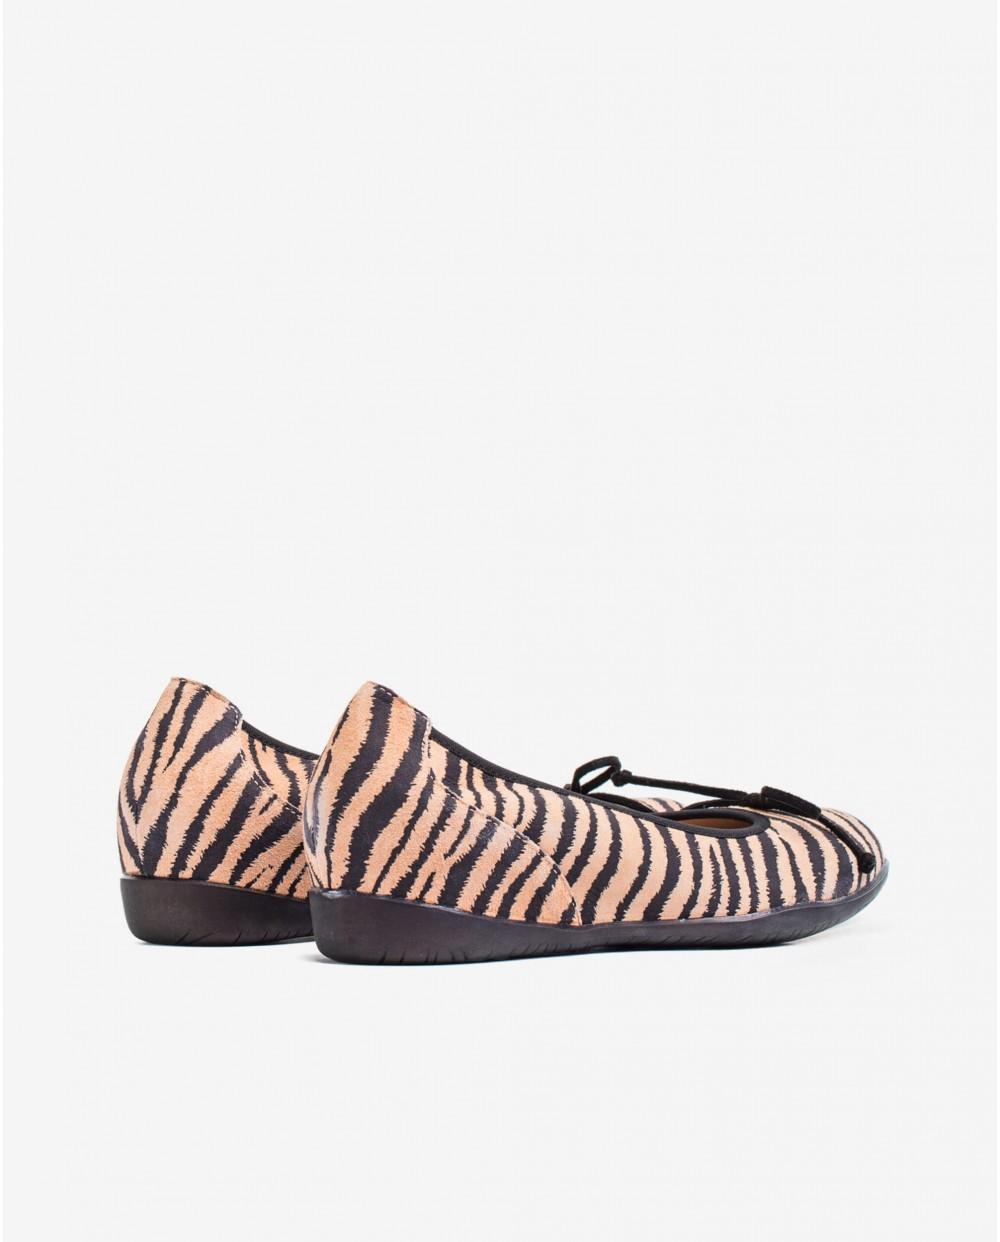 Wonders-Flat Shoes-Zebra print ballet pump with bow detail